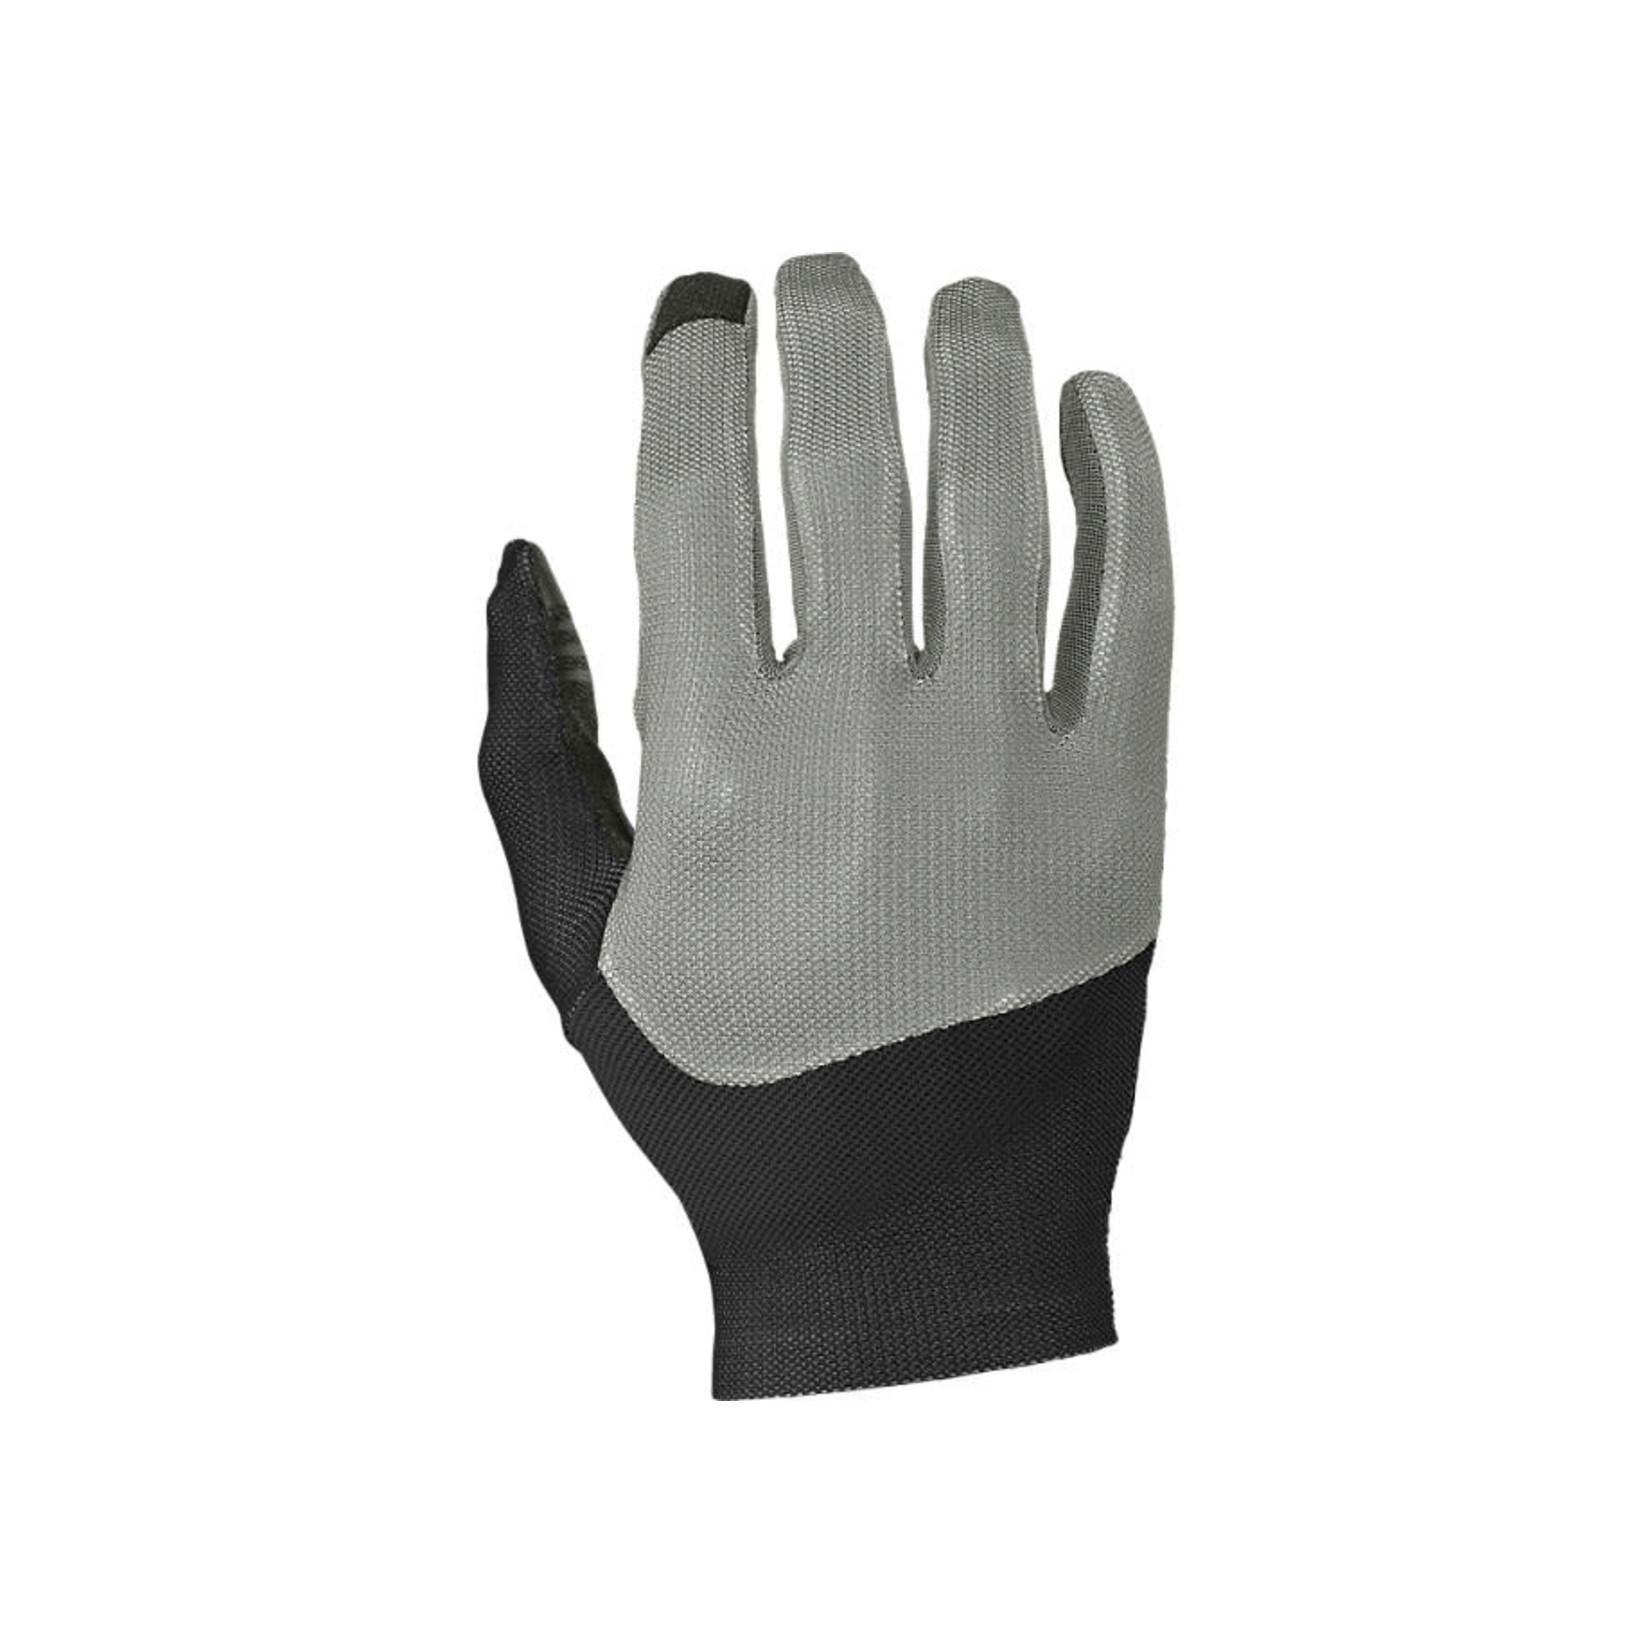 Specialized Specialized Renegade Glove Men's